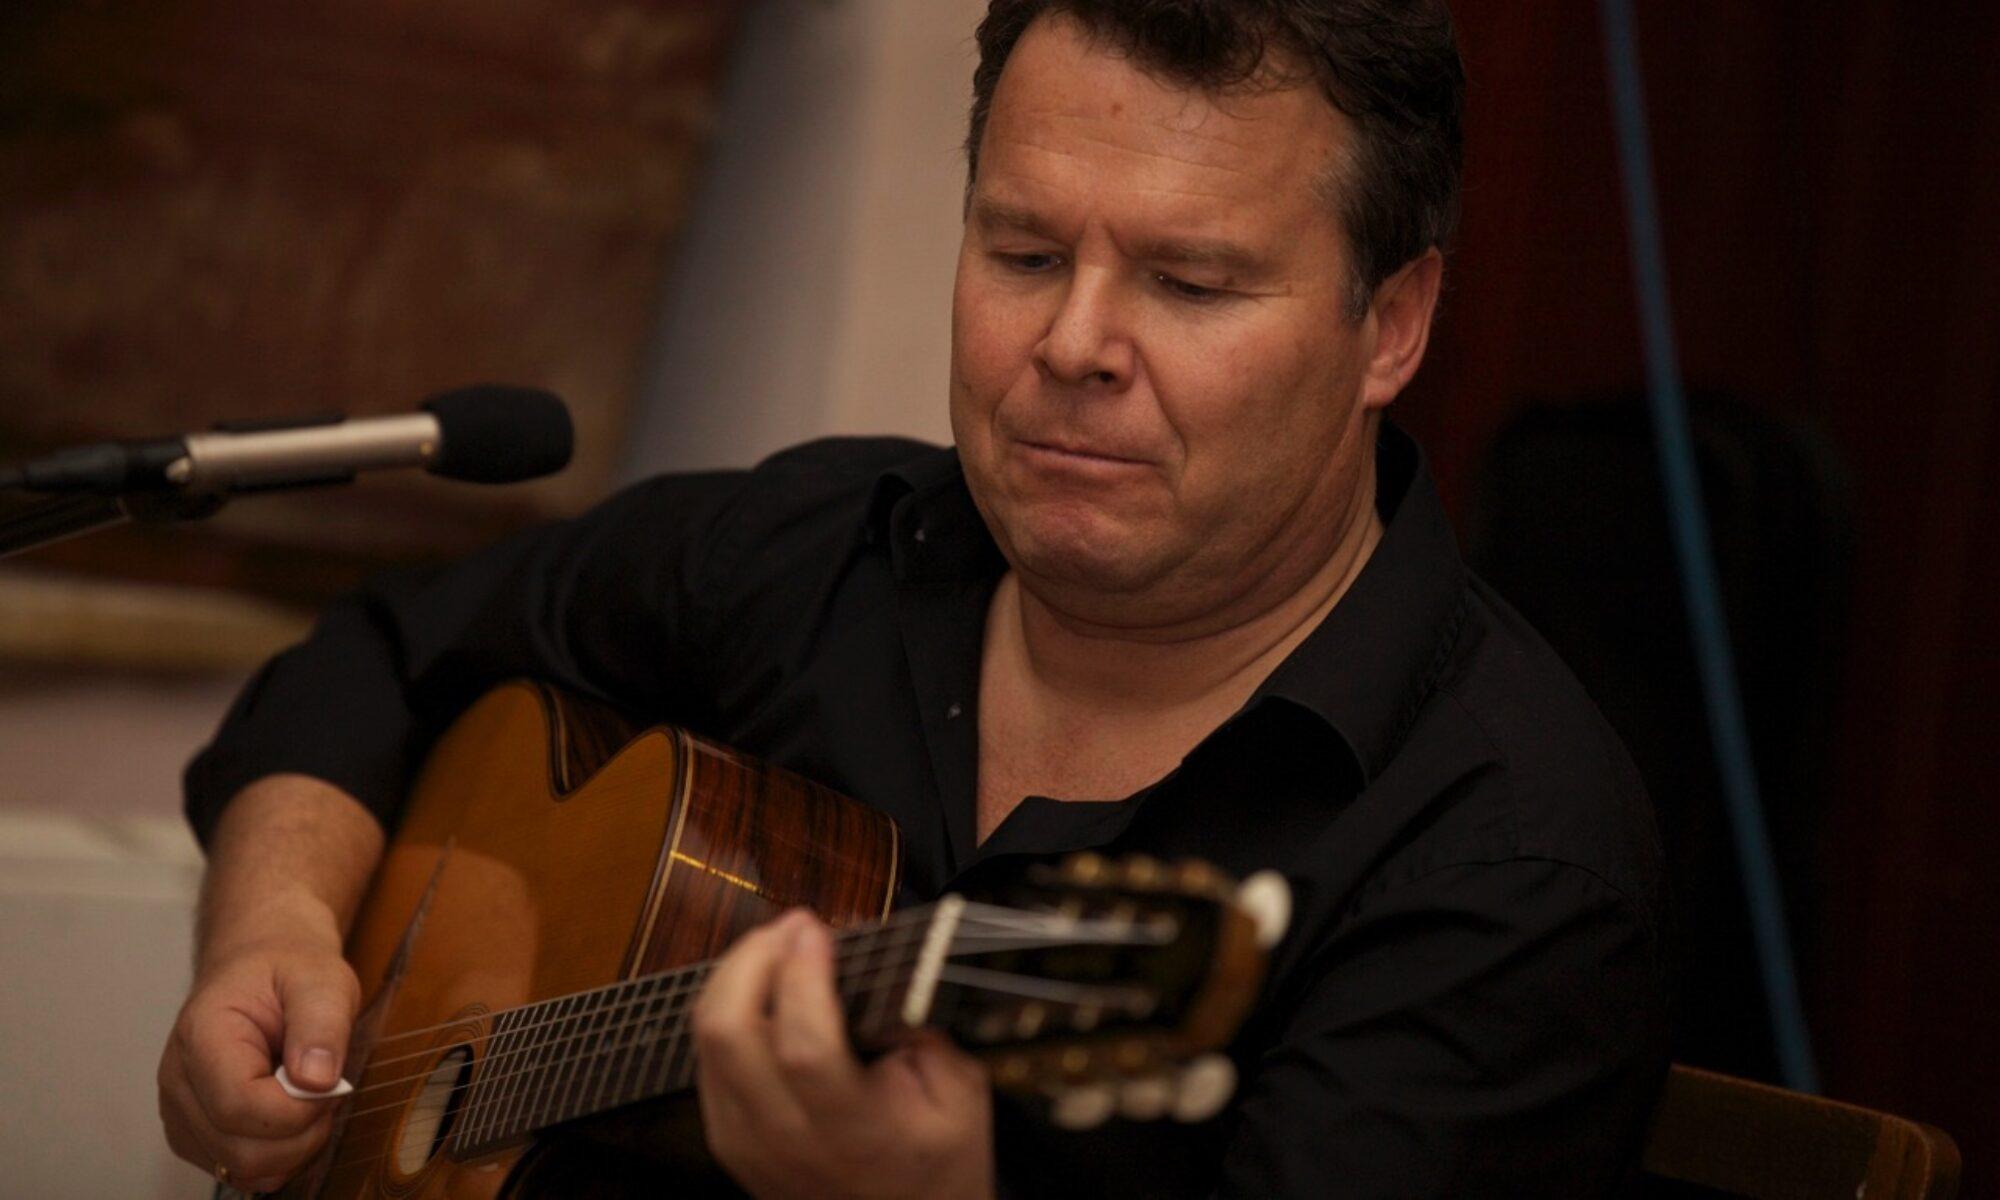 Michael Santifaller